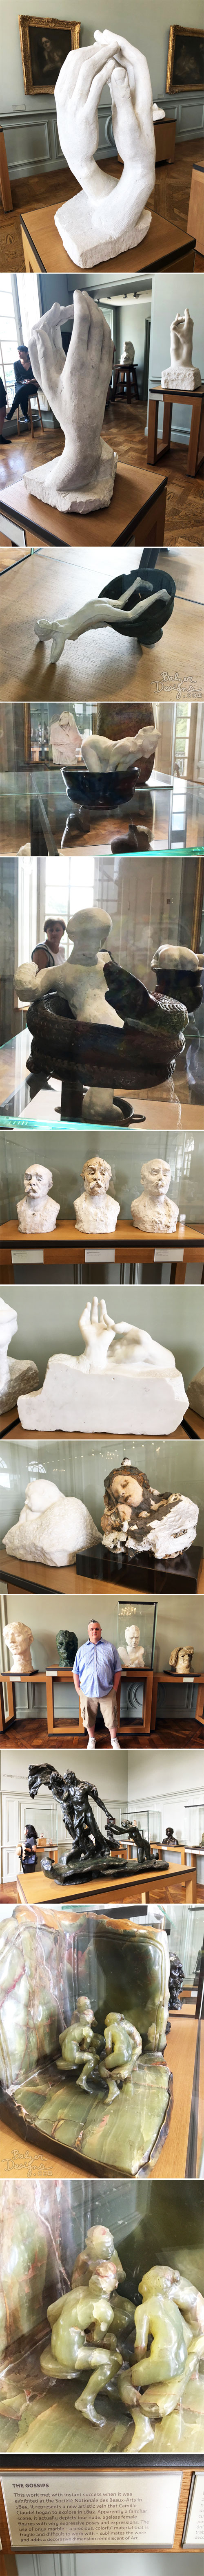 Rodin7-wm